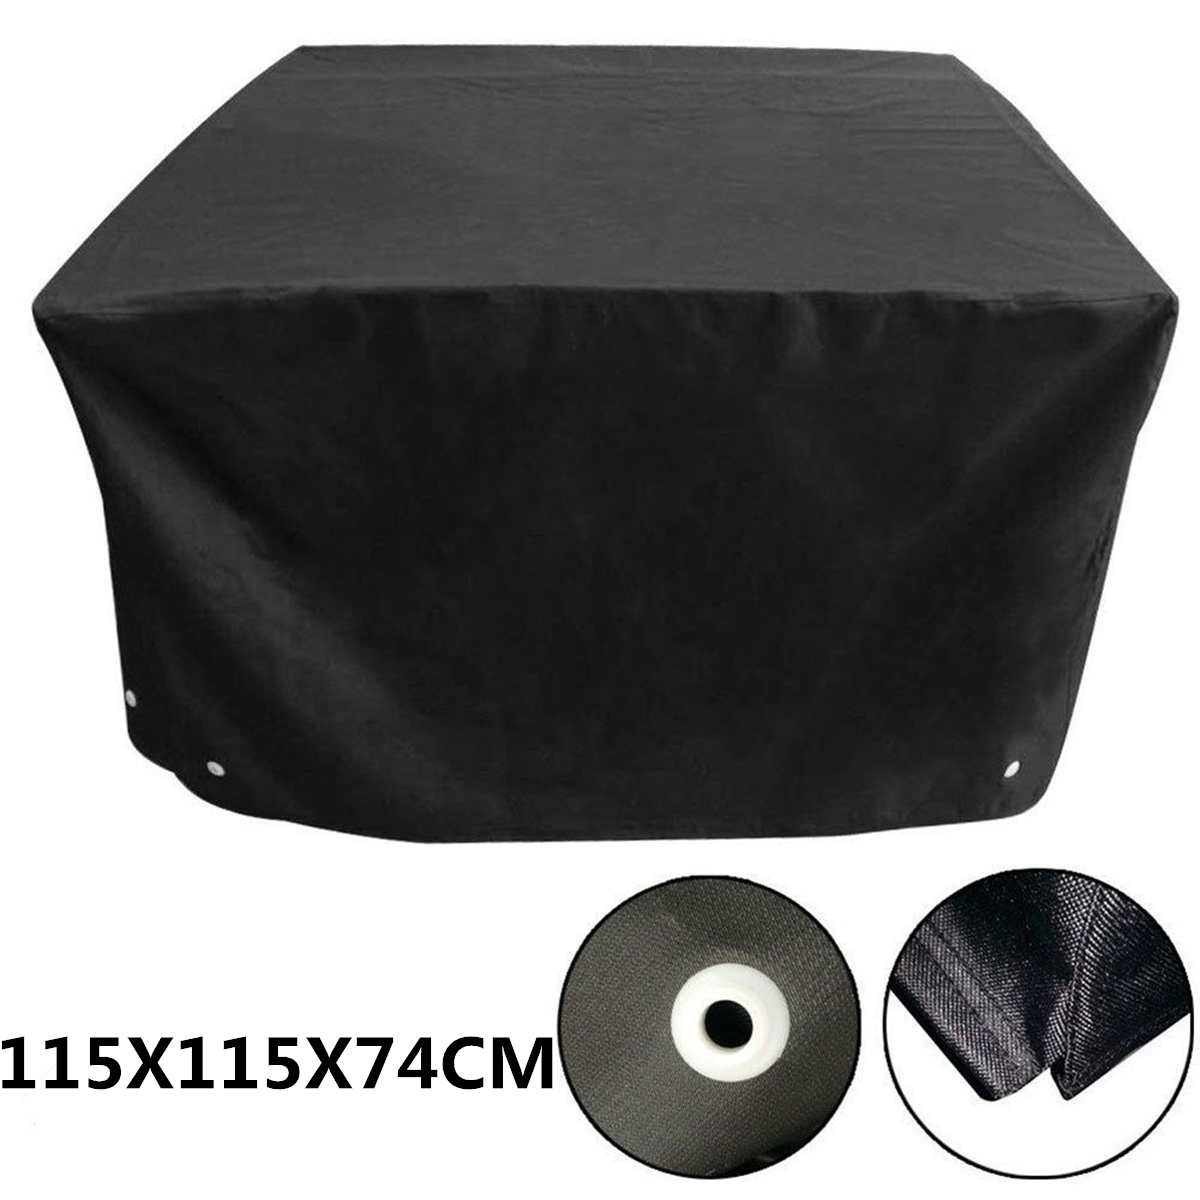 Large Waterproof Furniture Sofa Chair Set Cover Garden  : 2A9EC6739A53CF169C73D25316839BD28343AA669DD2CD669A73D254C643CF83C8839E9EA643C866C9A01303 from www.ebay.com size 1200 x 1200 jpeg 387kB